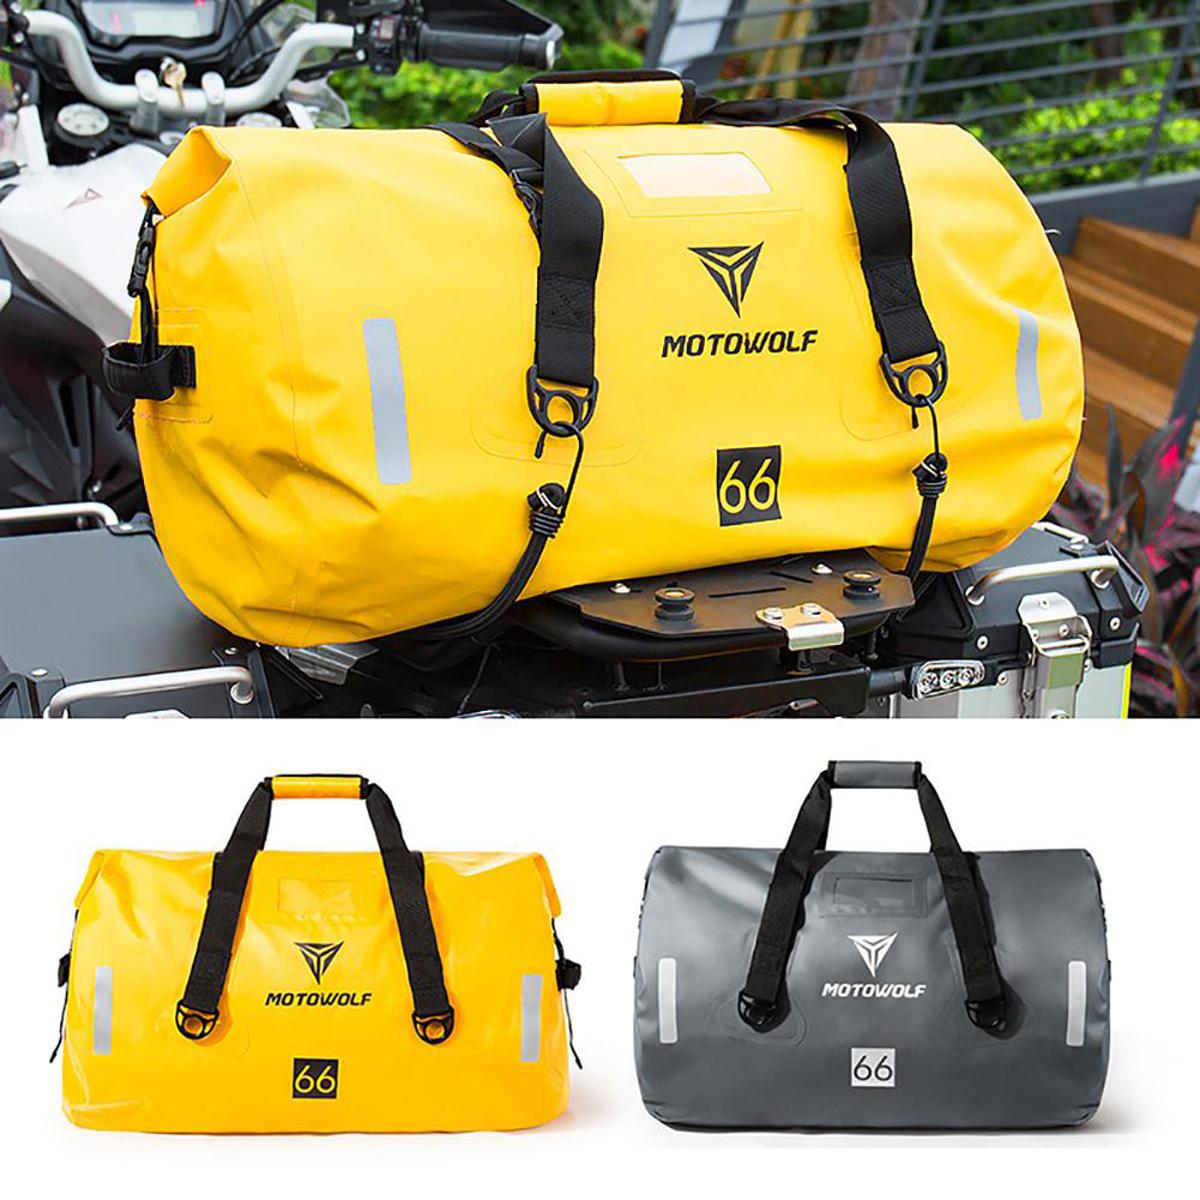 40L / 66L / 90L मोटरसाइकिल टूरिंग वाटरप्रूफ ड्राई लगेज बैग मोटरबाइक रोल पैक आउटडोर